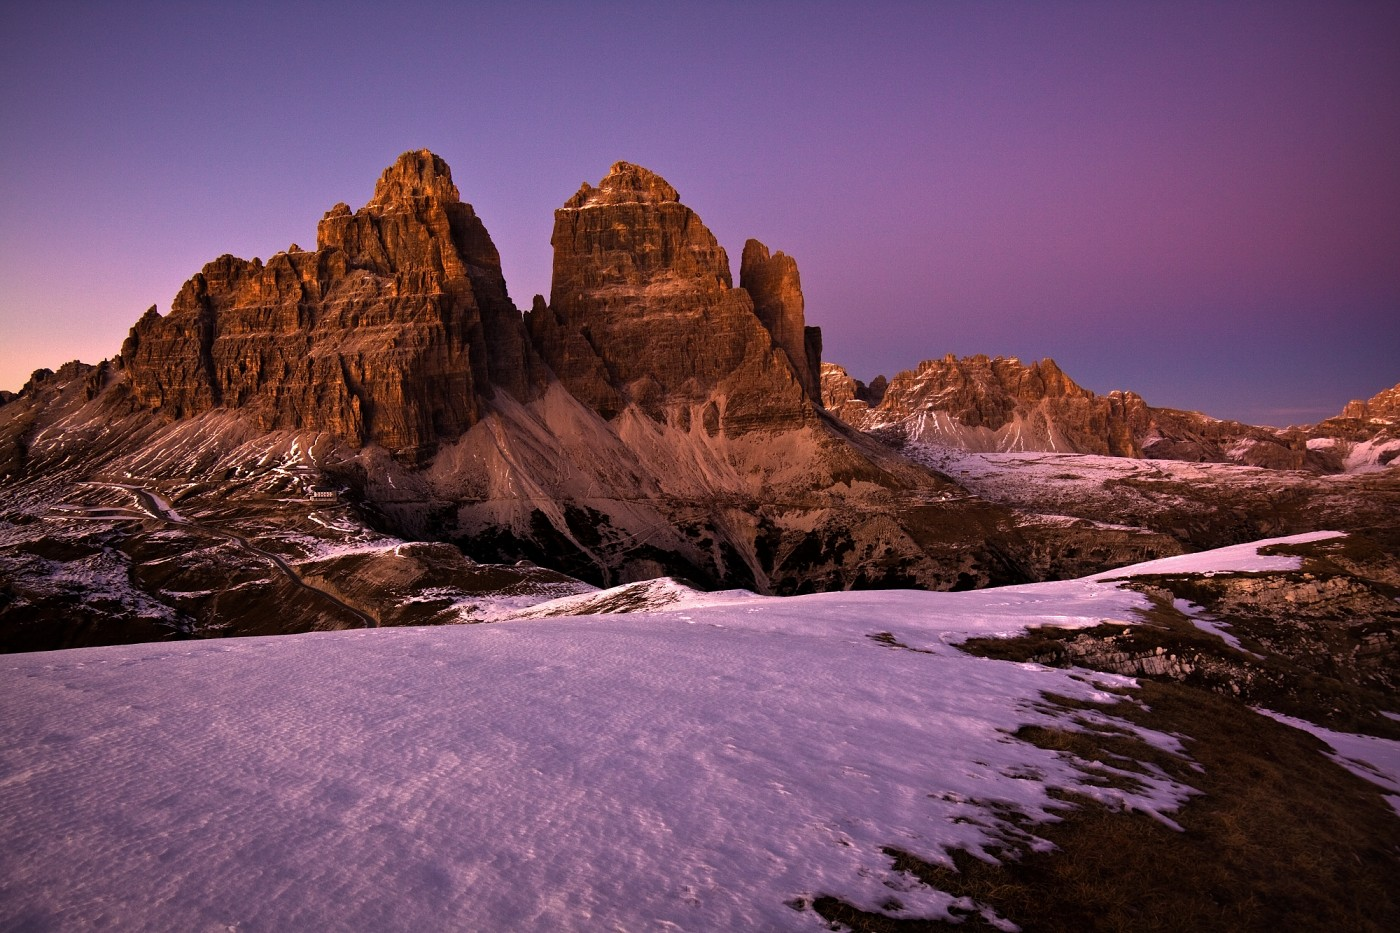 Tre Cime, Sextenské Dolomity, Itálie. Canon EOS 50D, Samyang 14mm f/2,8 UMC